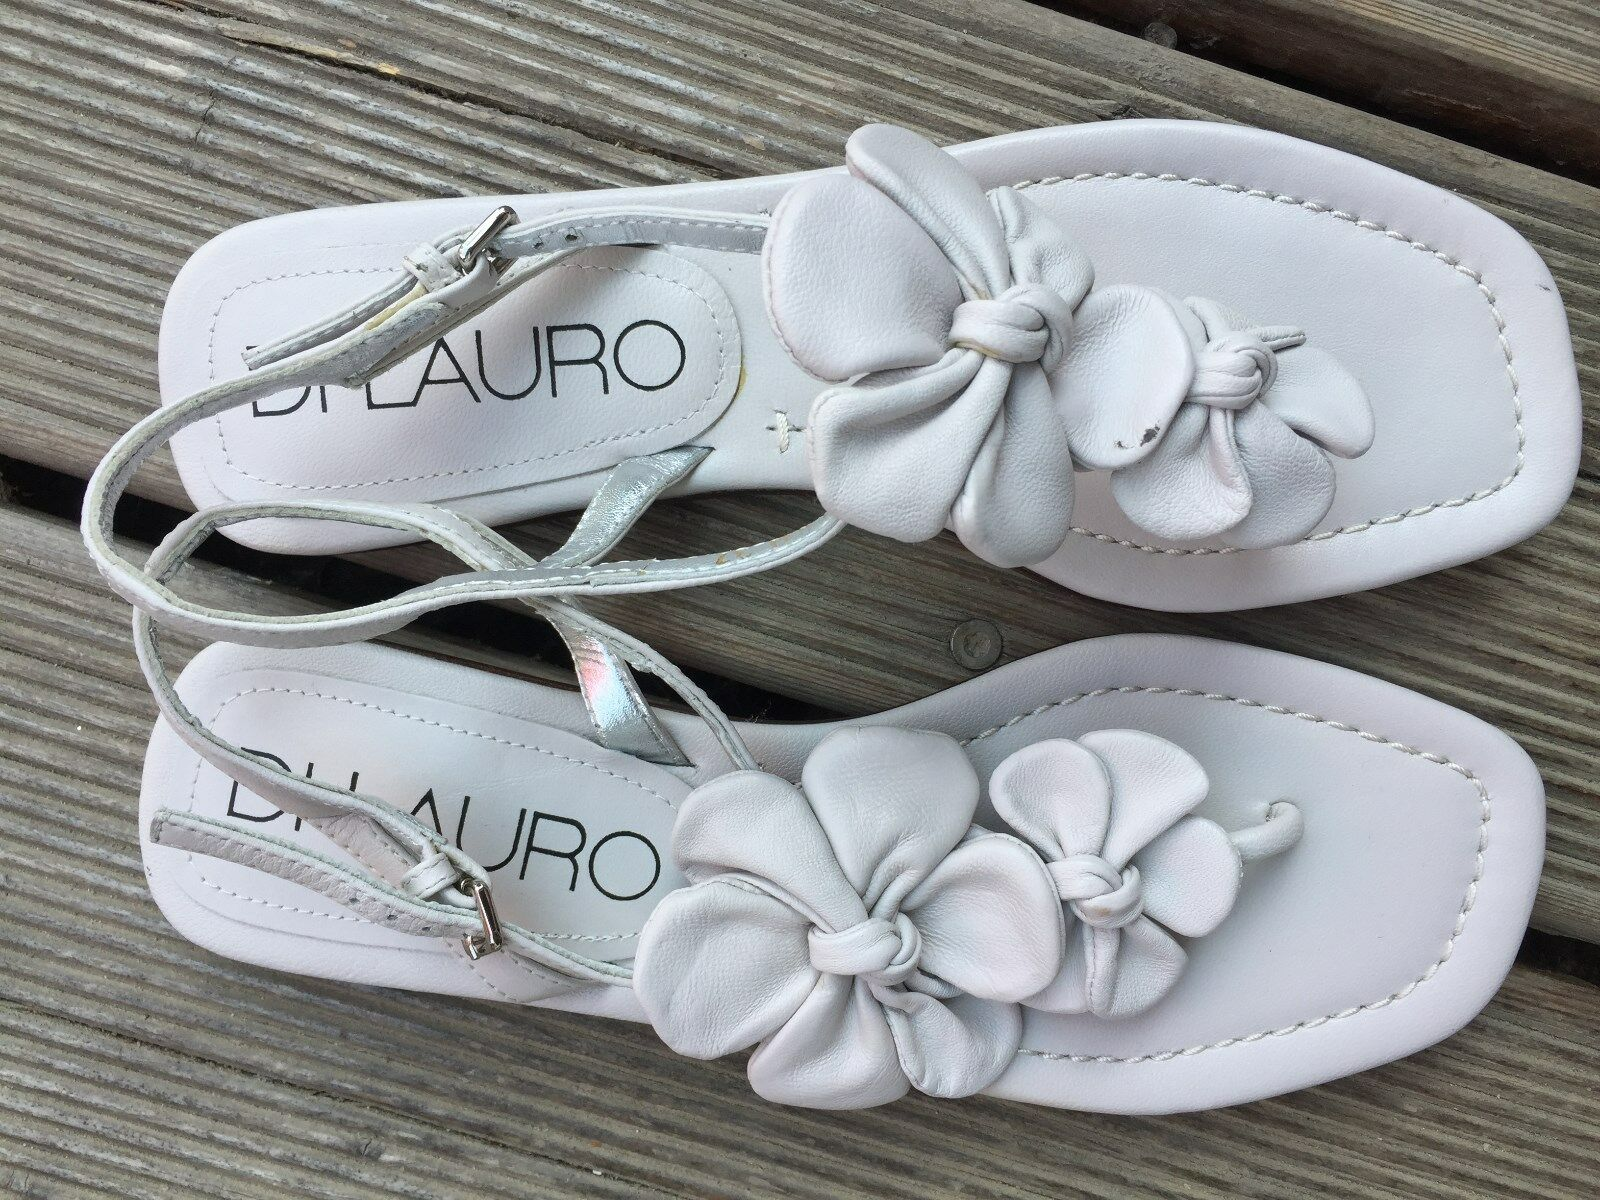 Di 37 Lauro Sandalen Zehentrenner Gr. 37 Di sehr hübsche Schuhe 11a8c5